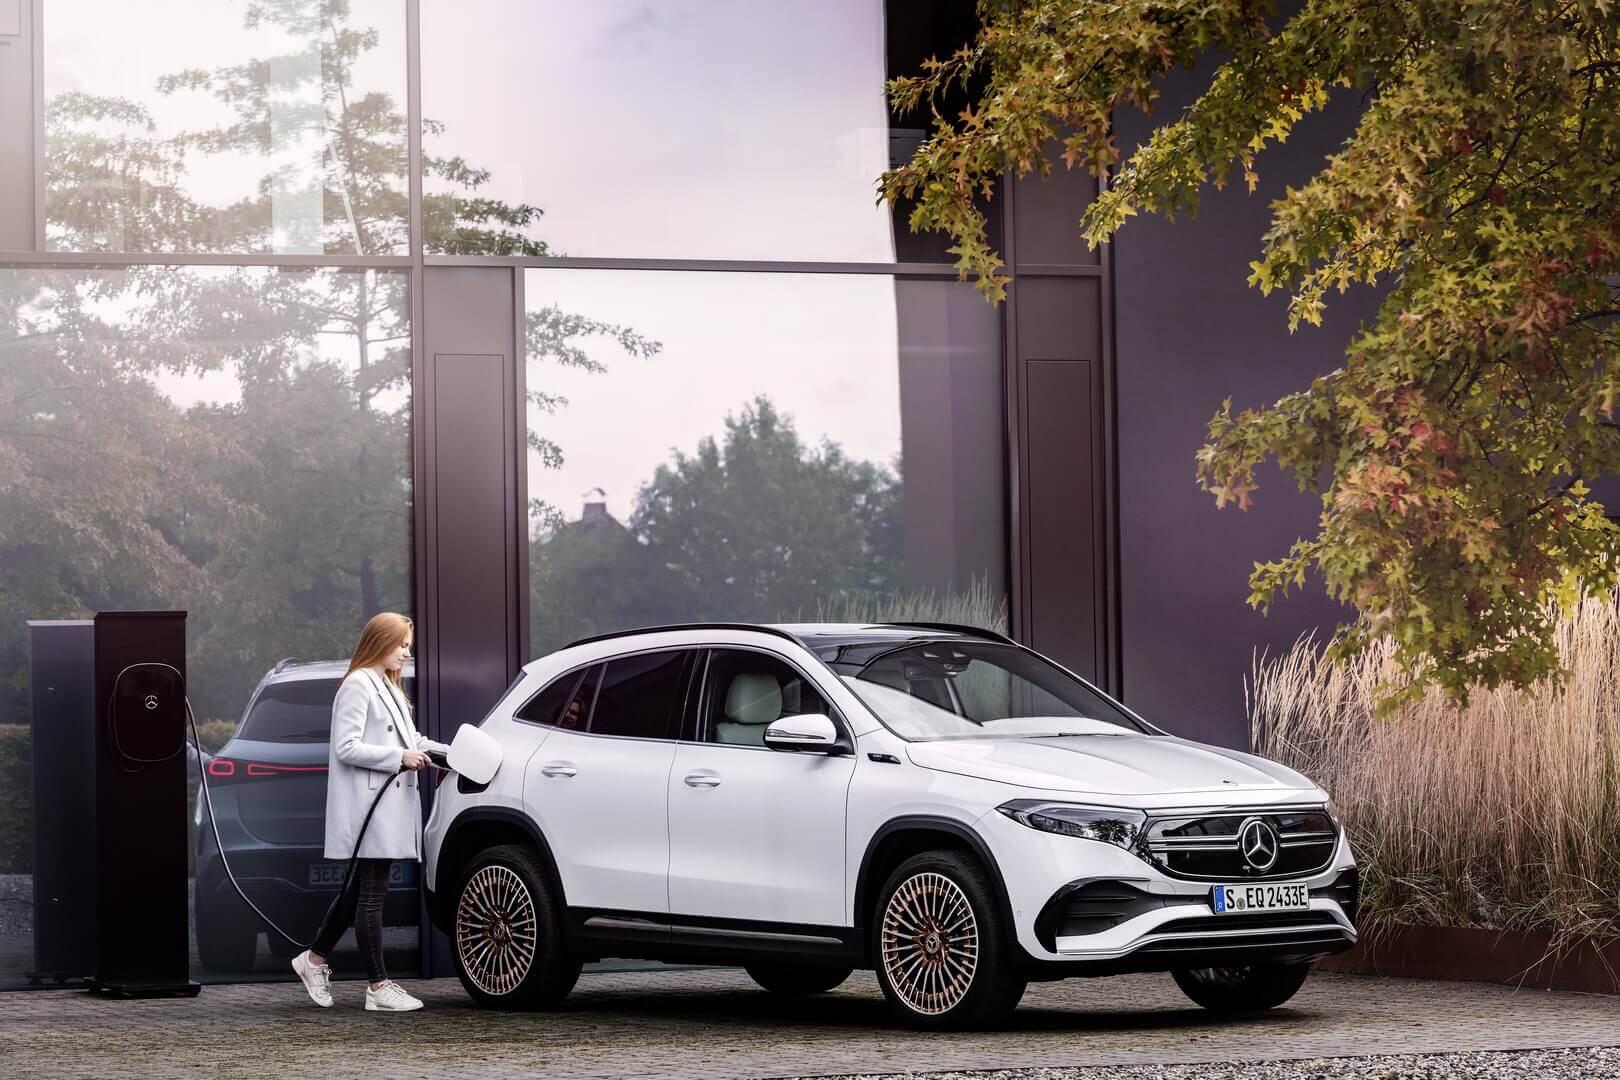 Mercedes-Benz EQA признан самым маленьким идоступным электромобилем бренда